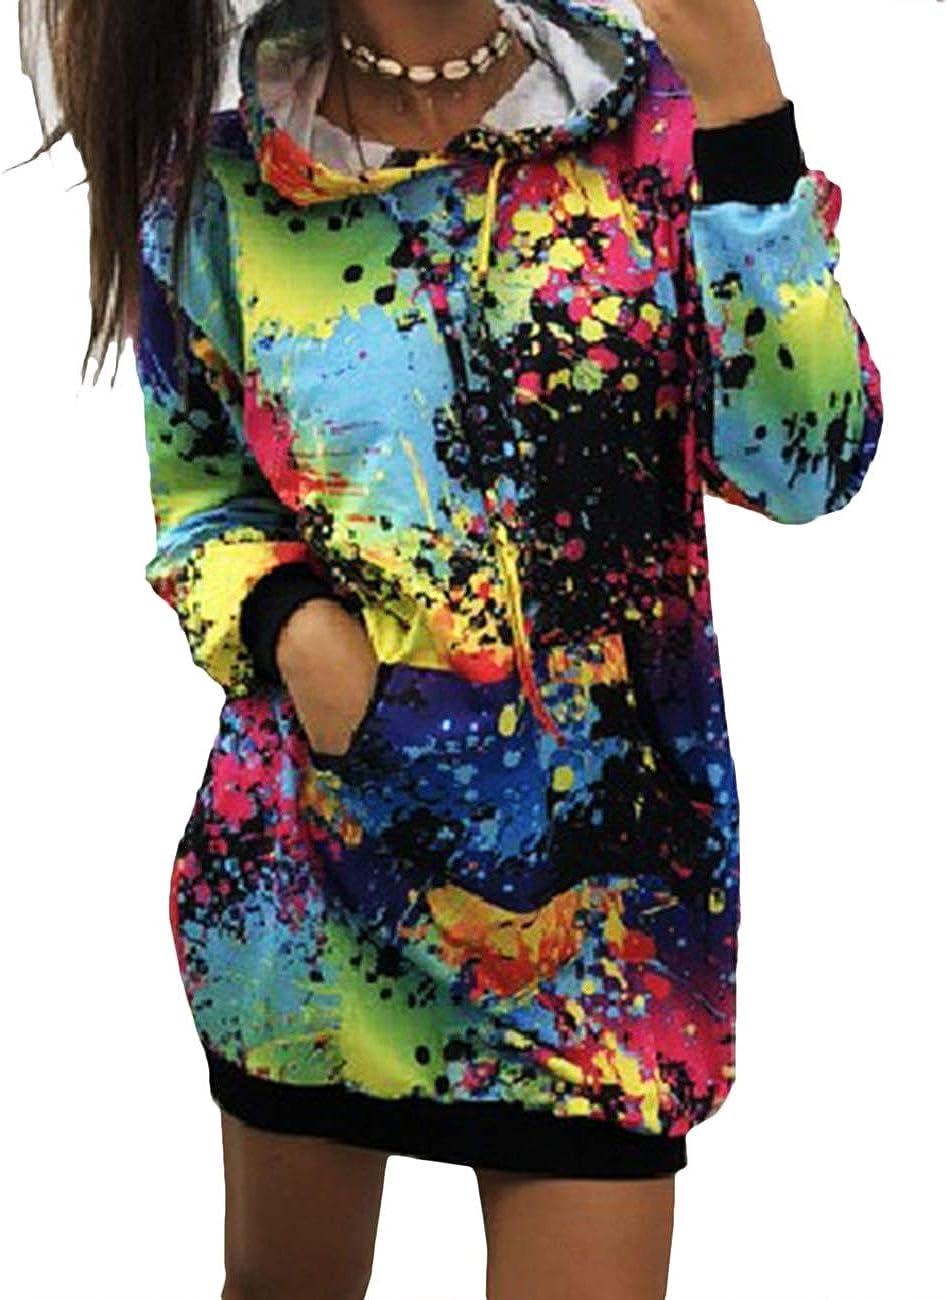 xxxiticat Women's Colorful Tie Dyeing Print Sweatshirt Tops Hooded Rainbow Long Sleeve Shirt Dress Splatter Pullover Hoodies